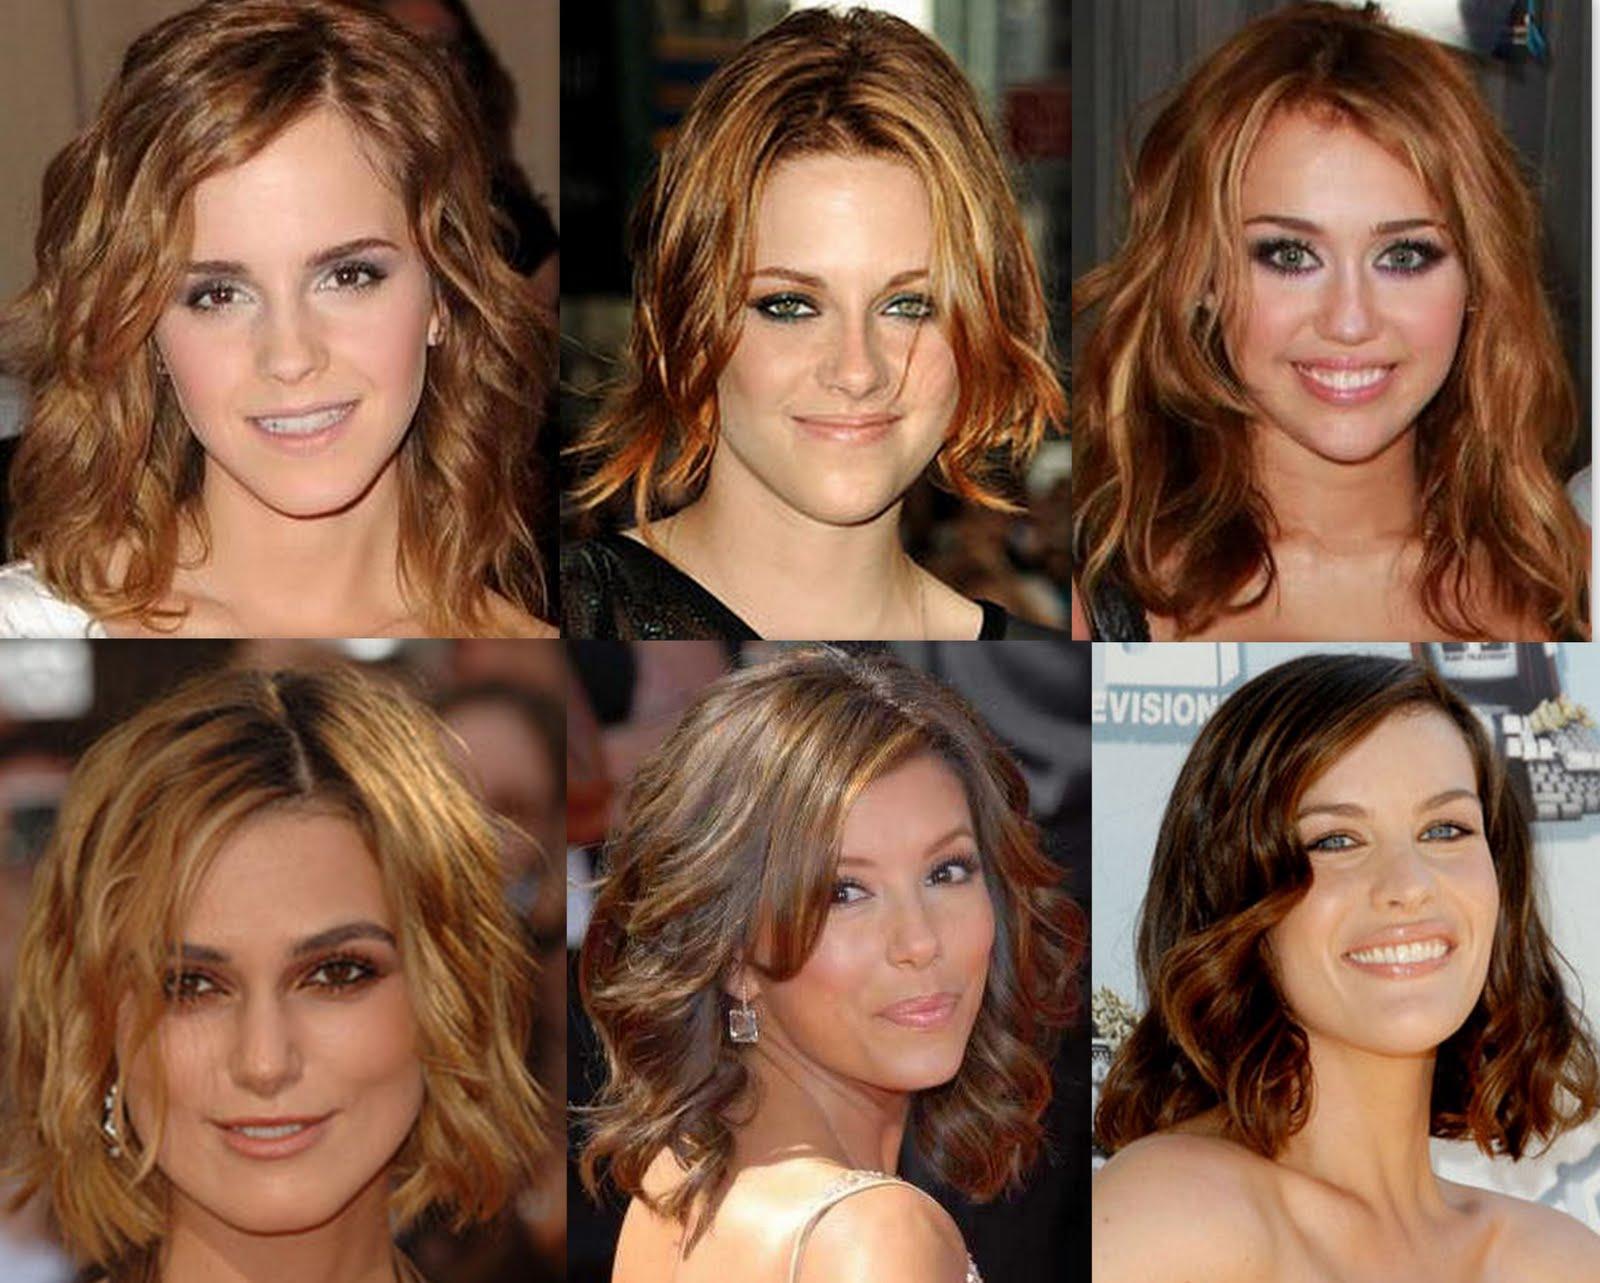 http://3.bp.blogspot.com/_fhHBbvKMUs0/TGrF_fWpesI/AAAAAAAAAVg/hVhCsePFo78/s1600/cabelos1.jpg